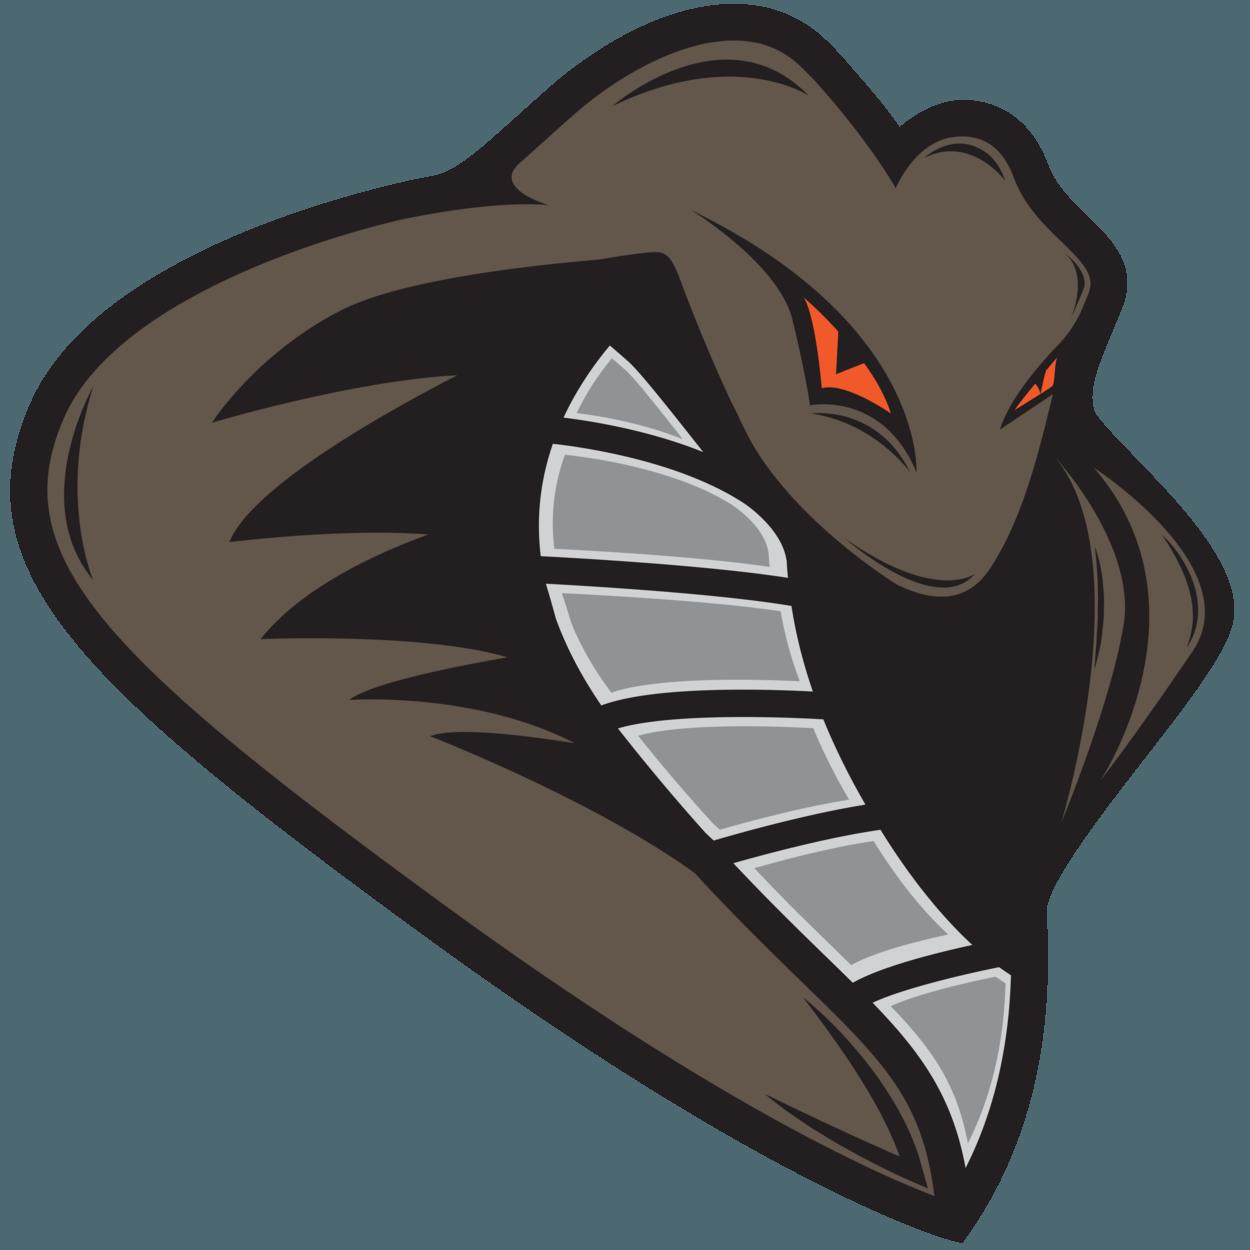 Kids bjj sports logos kickboxing snakes logo design stickers draw